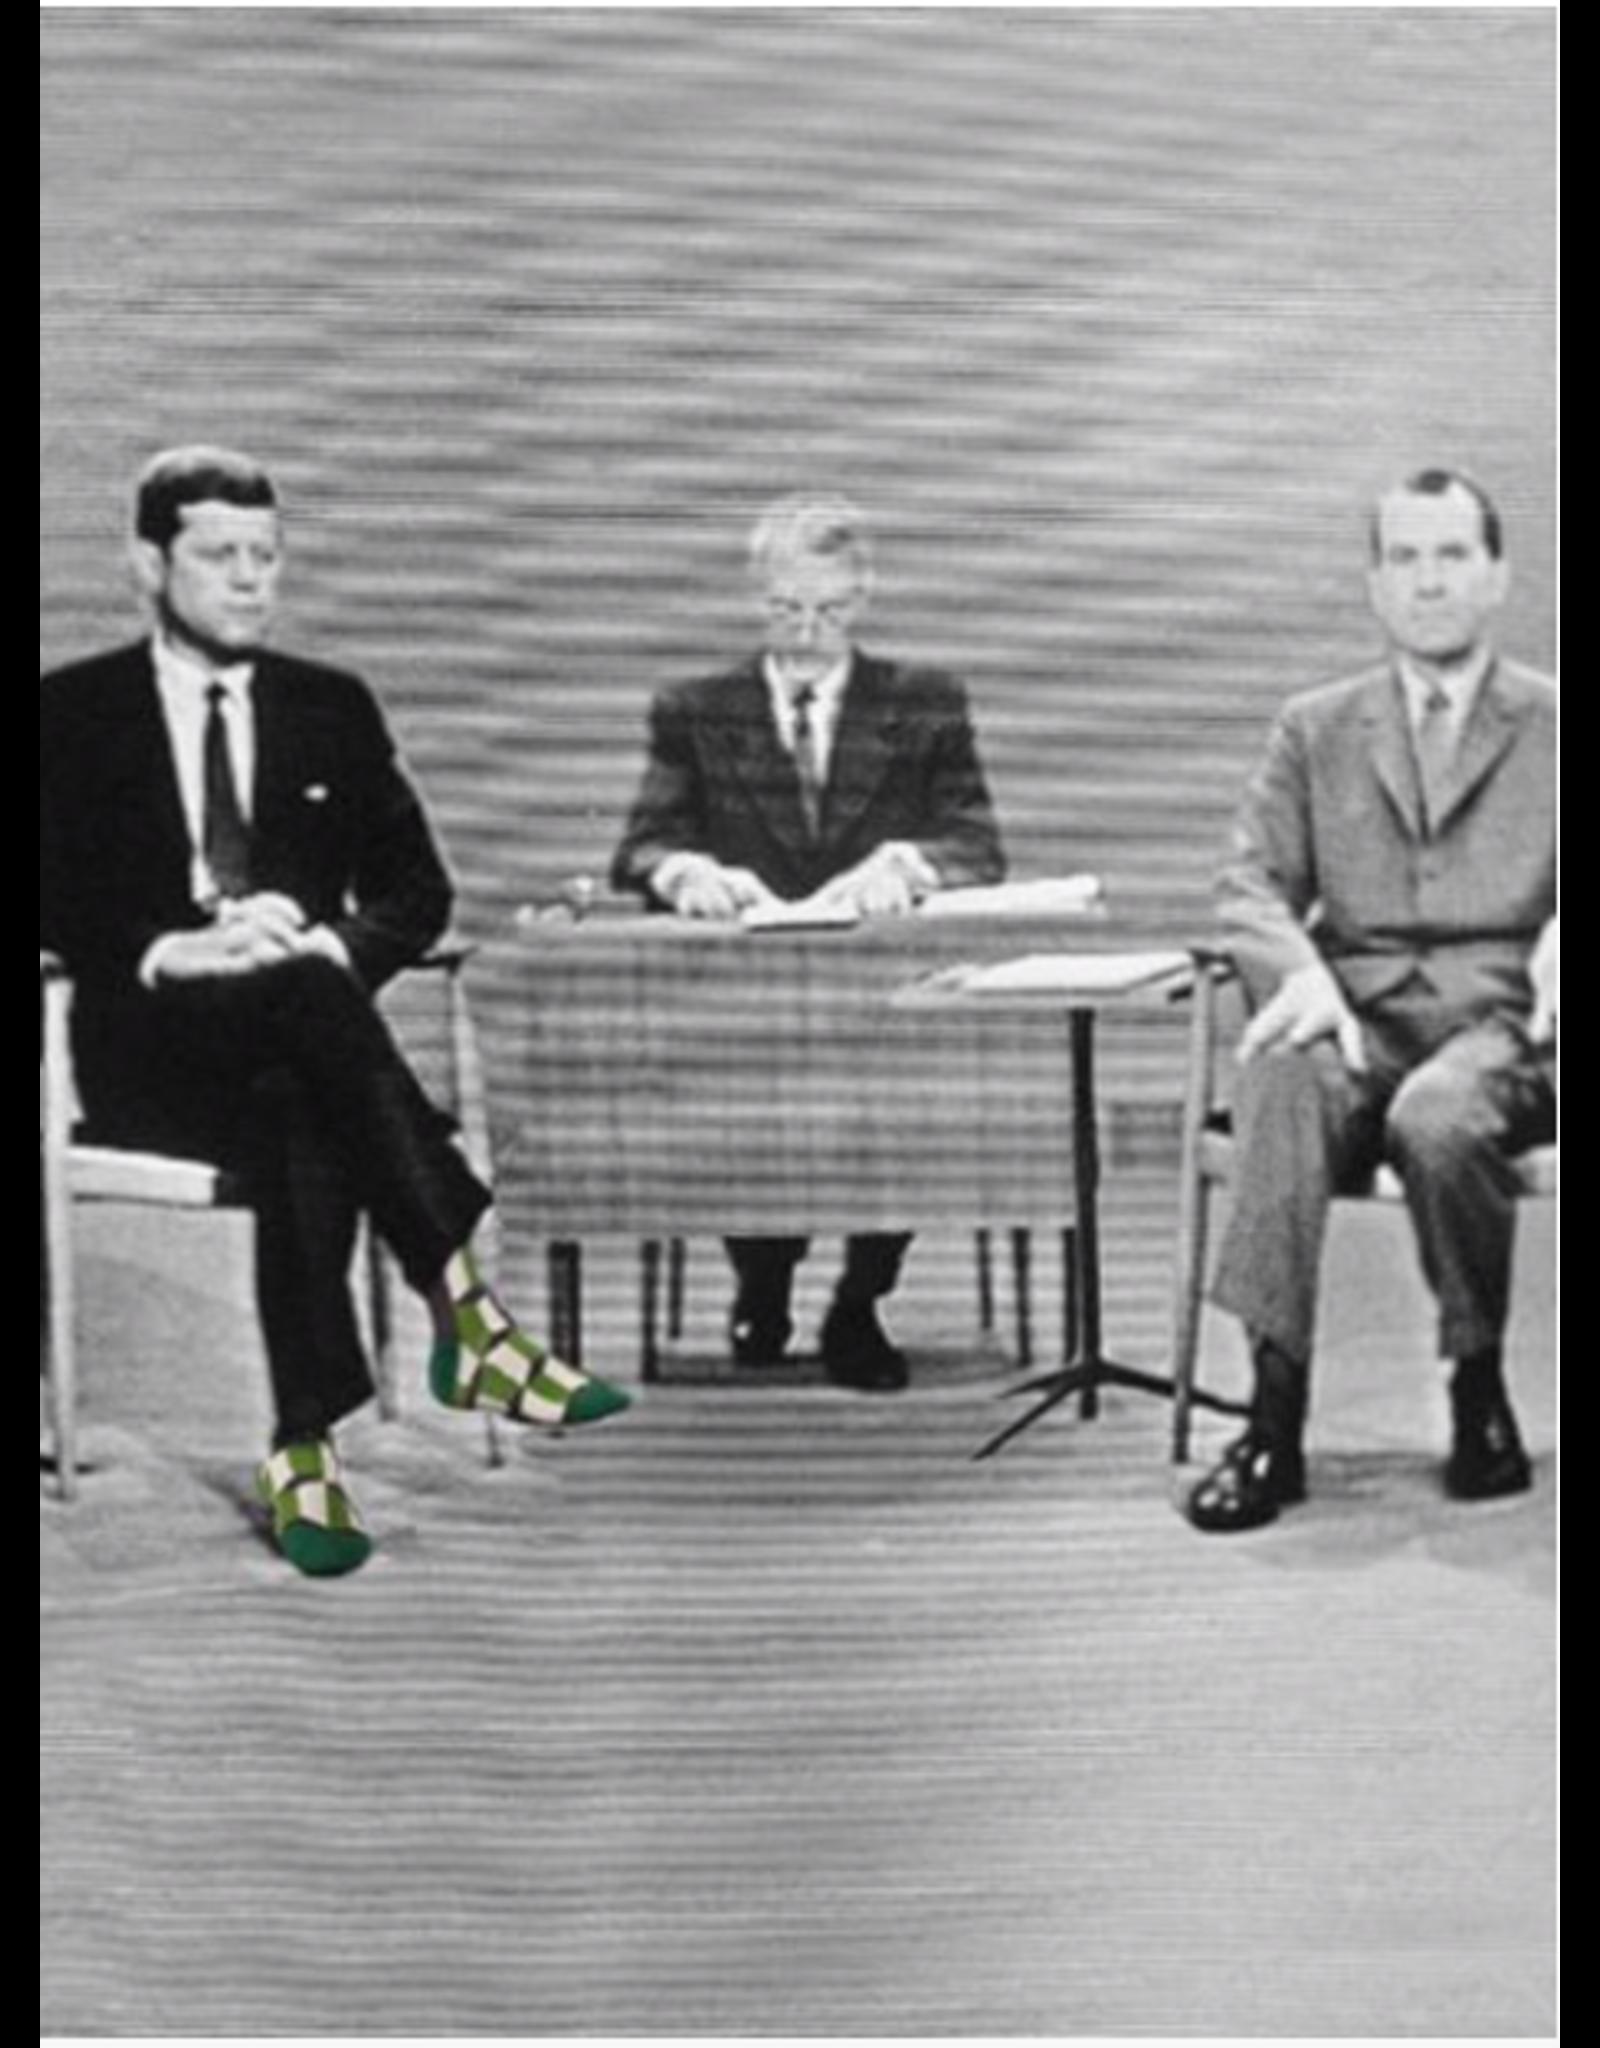 Blue Q Blue Q - This Meeting is Bullsh!t crew socks (men's size)